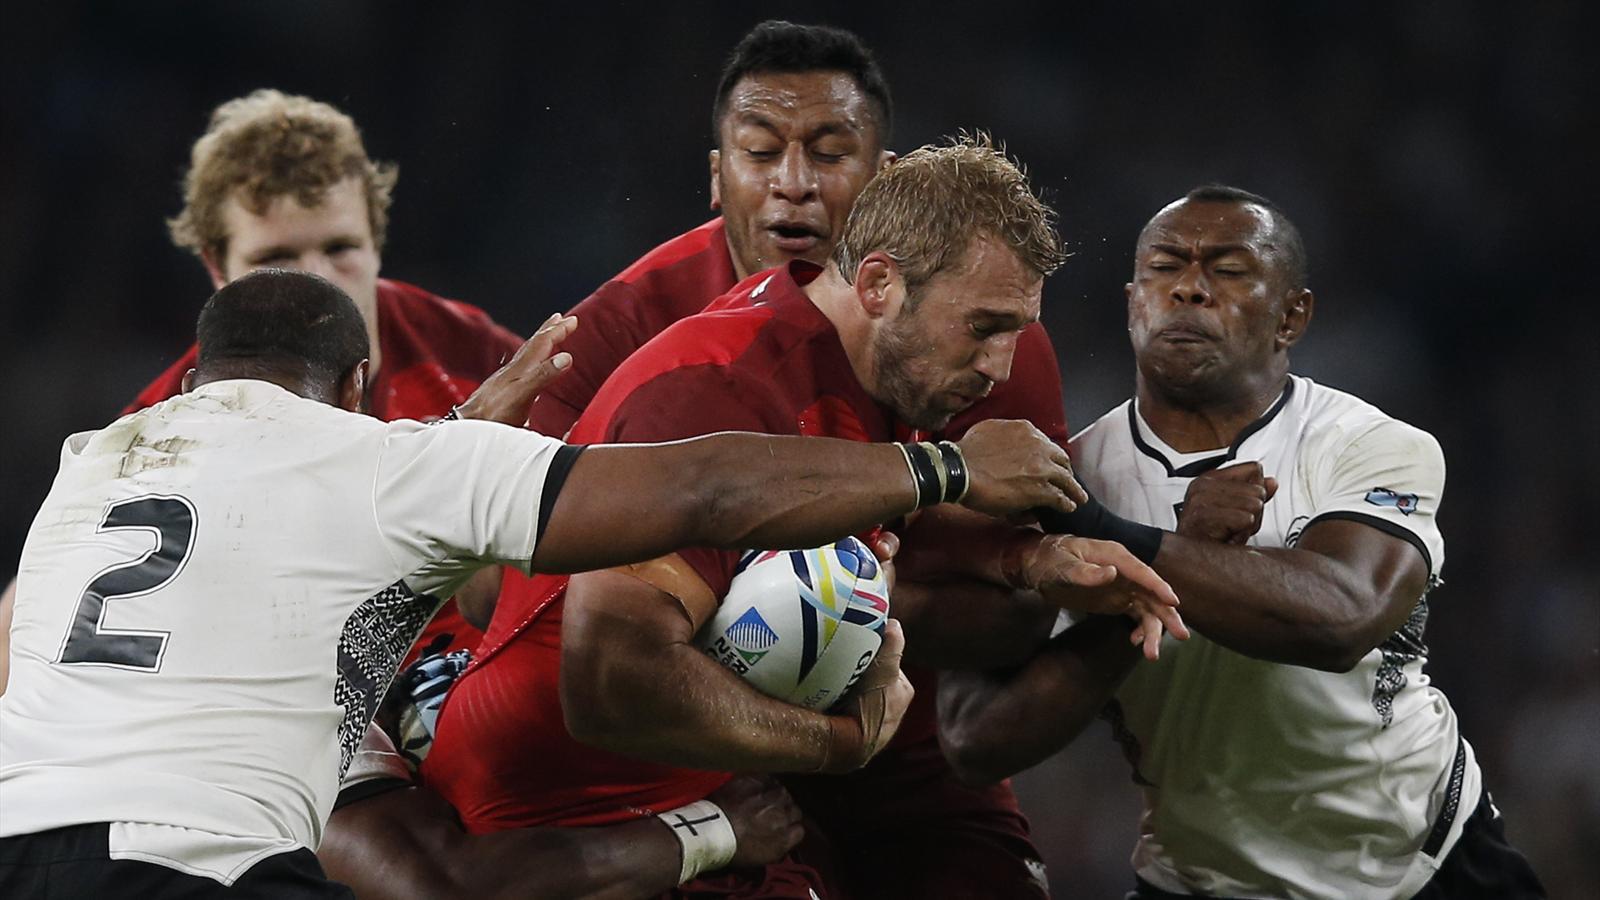 Rugby angleterre fidji 35 11 l 39 angleterre ne pouvait - Resultats coupe du monde de rugby 2015 ...